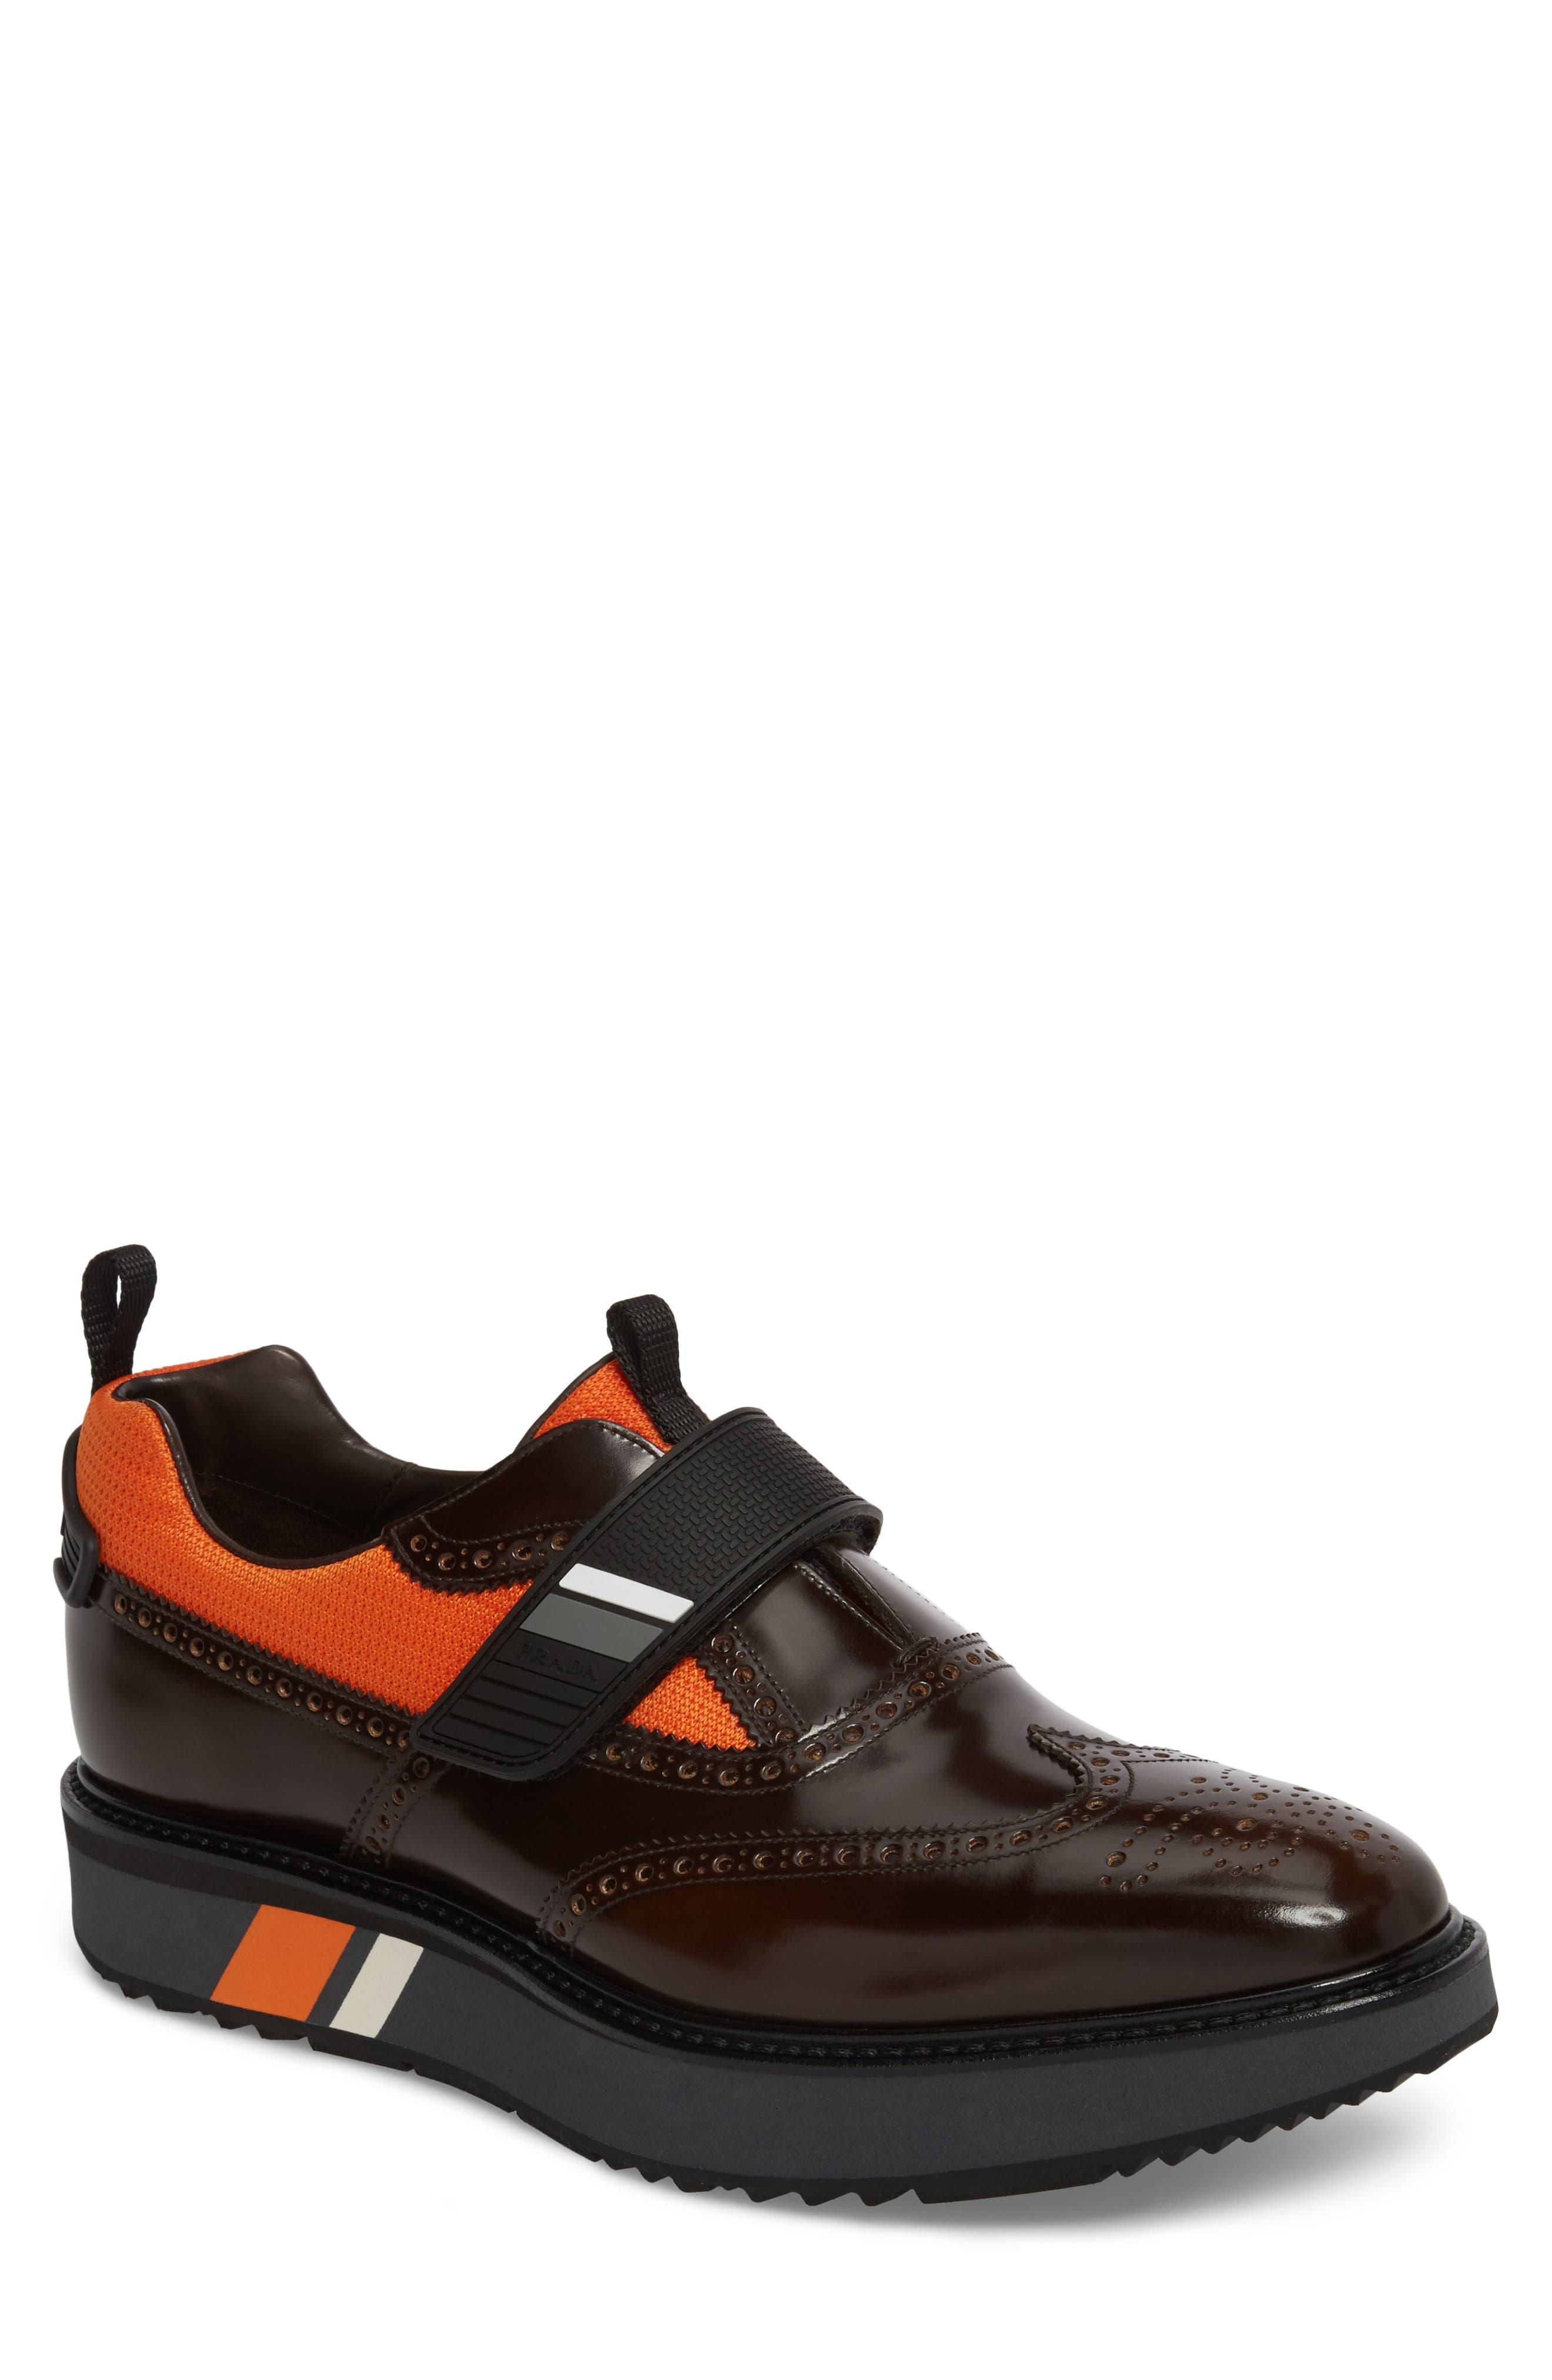 Strap Wingtip Sneaker,                         Main,                         color, 200